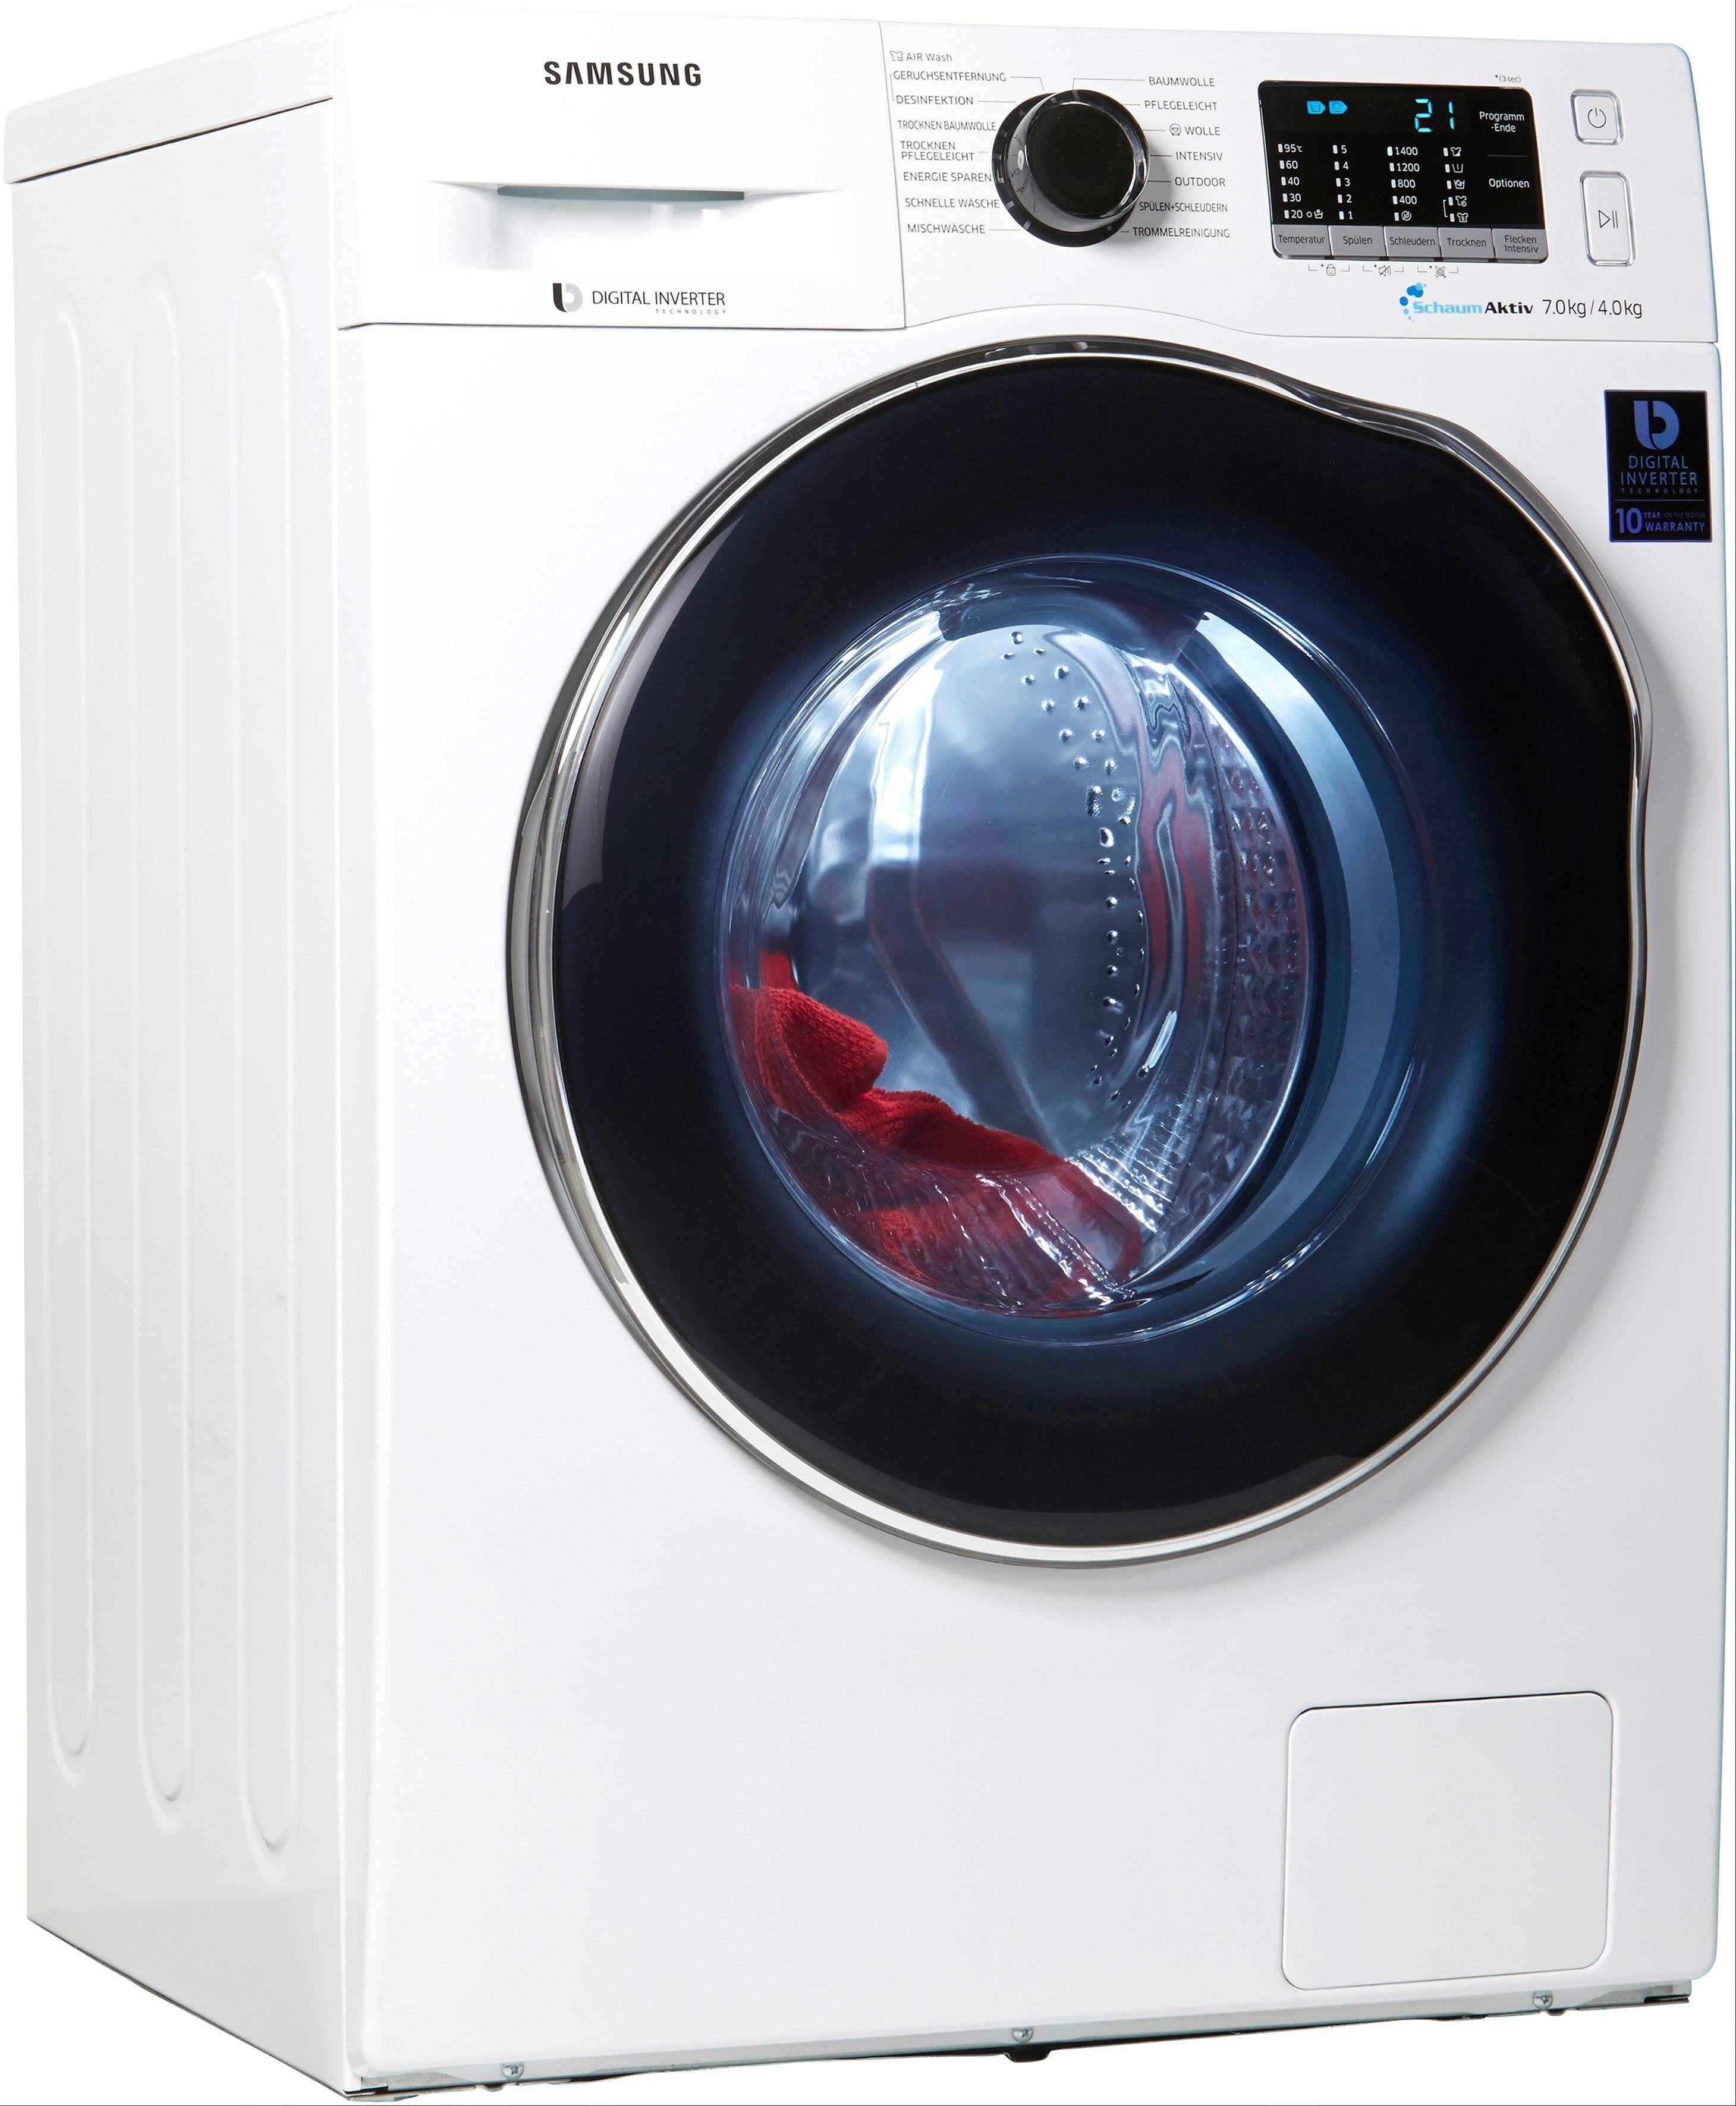 Samsung Waschtrockner WD5000 WD70J5A00AW, 7 kg/4 kg, 1400 U/Min, SchaumAktiv, Energieeffizienzklasse A